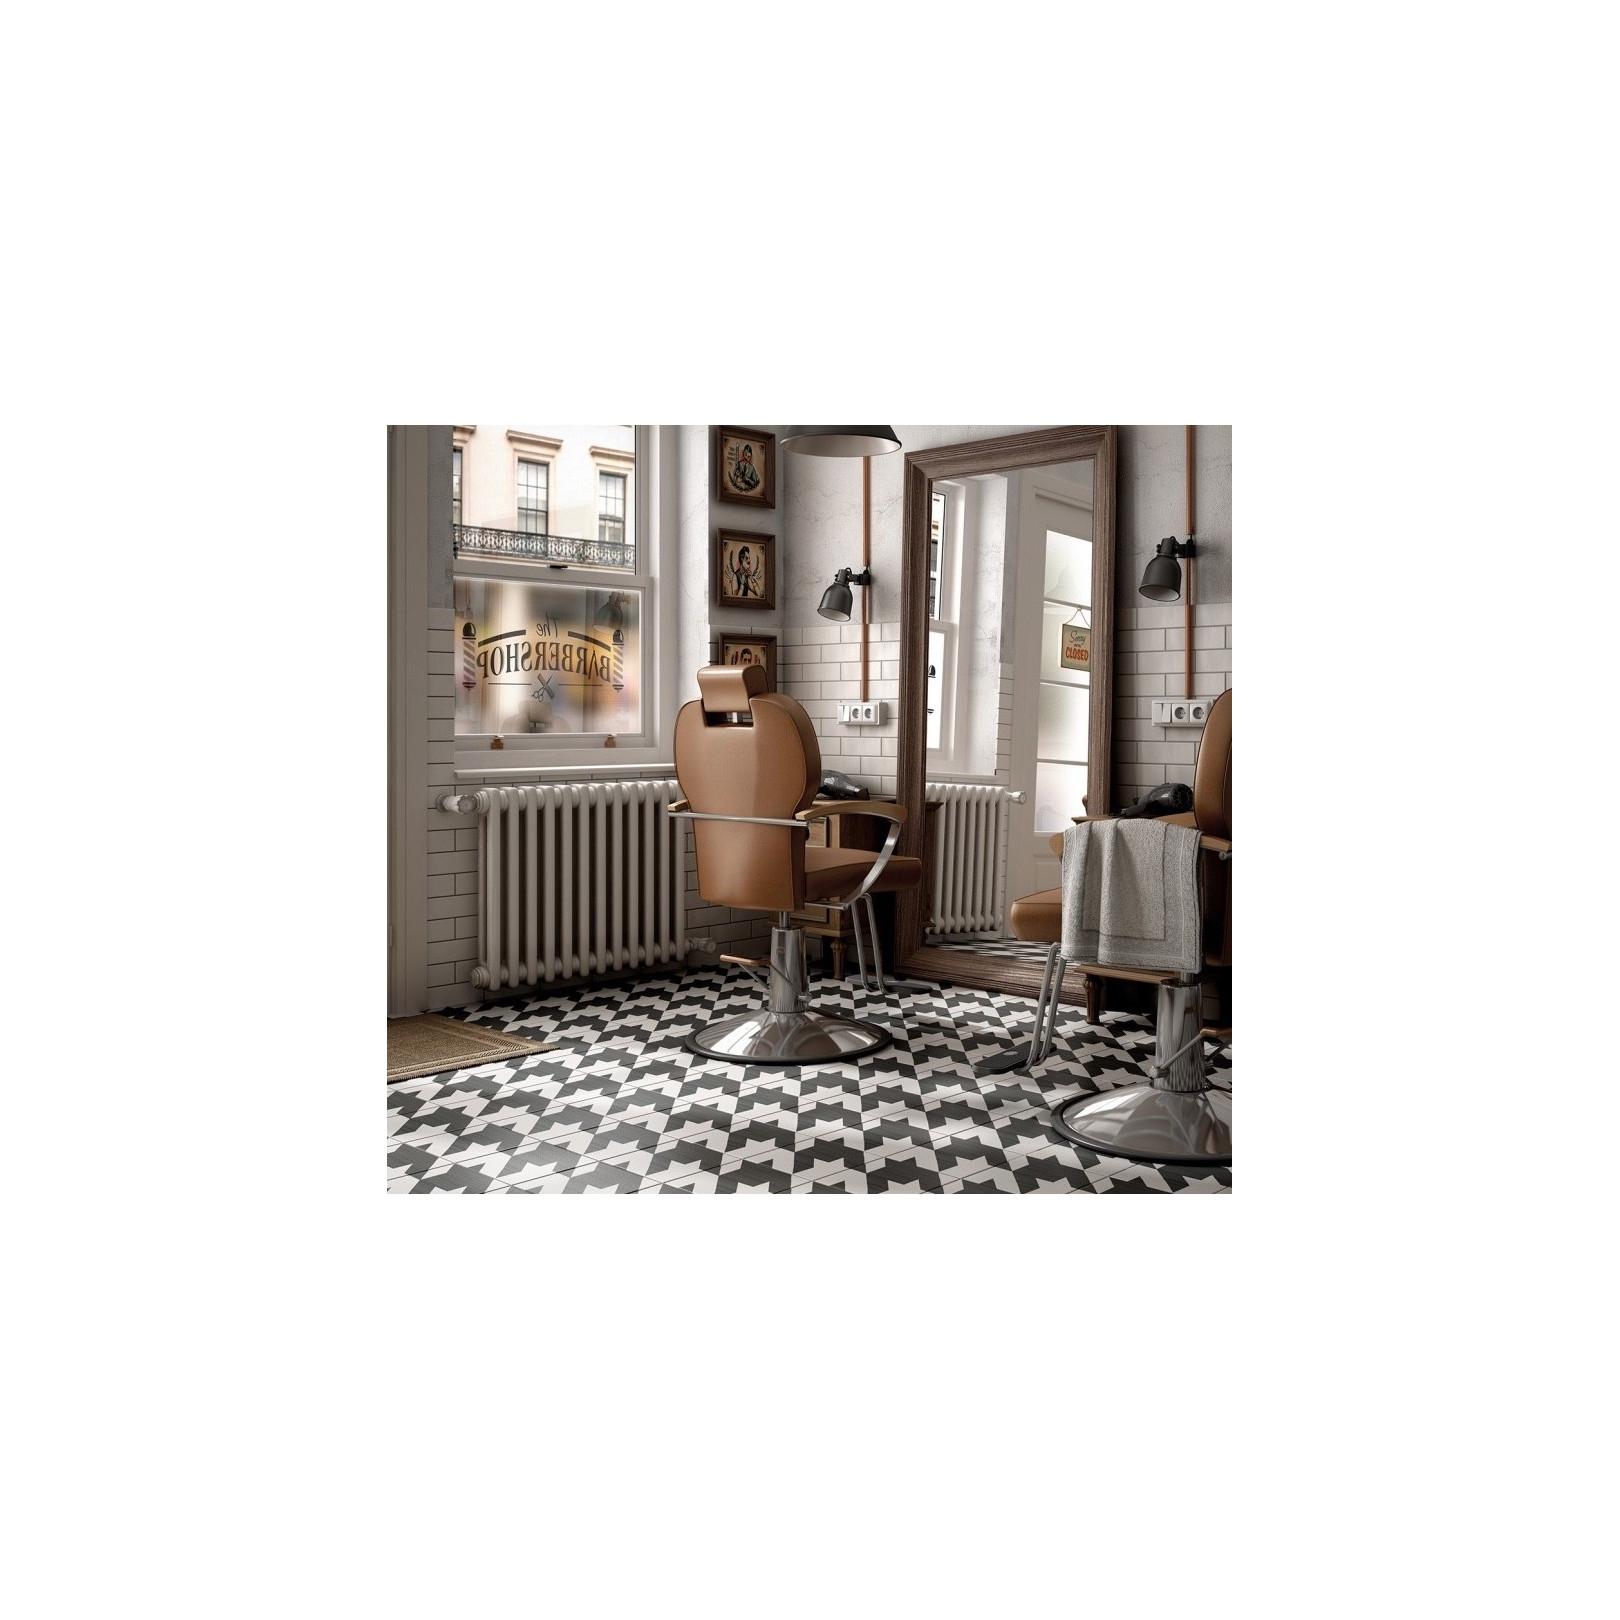 Carrelage grès cérame effet carreau ciment Caprice Deco B&W Tweed